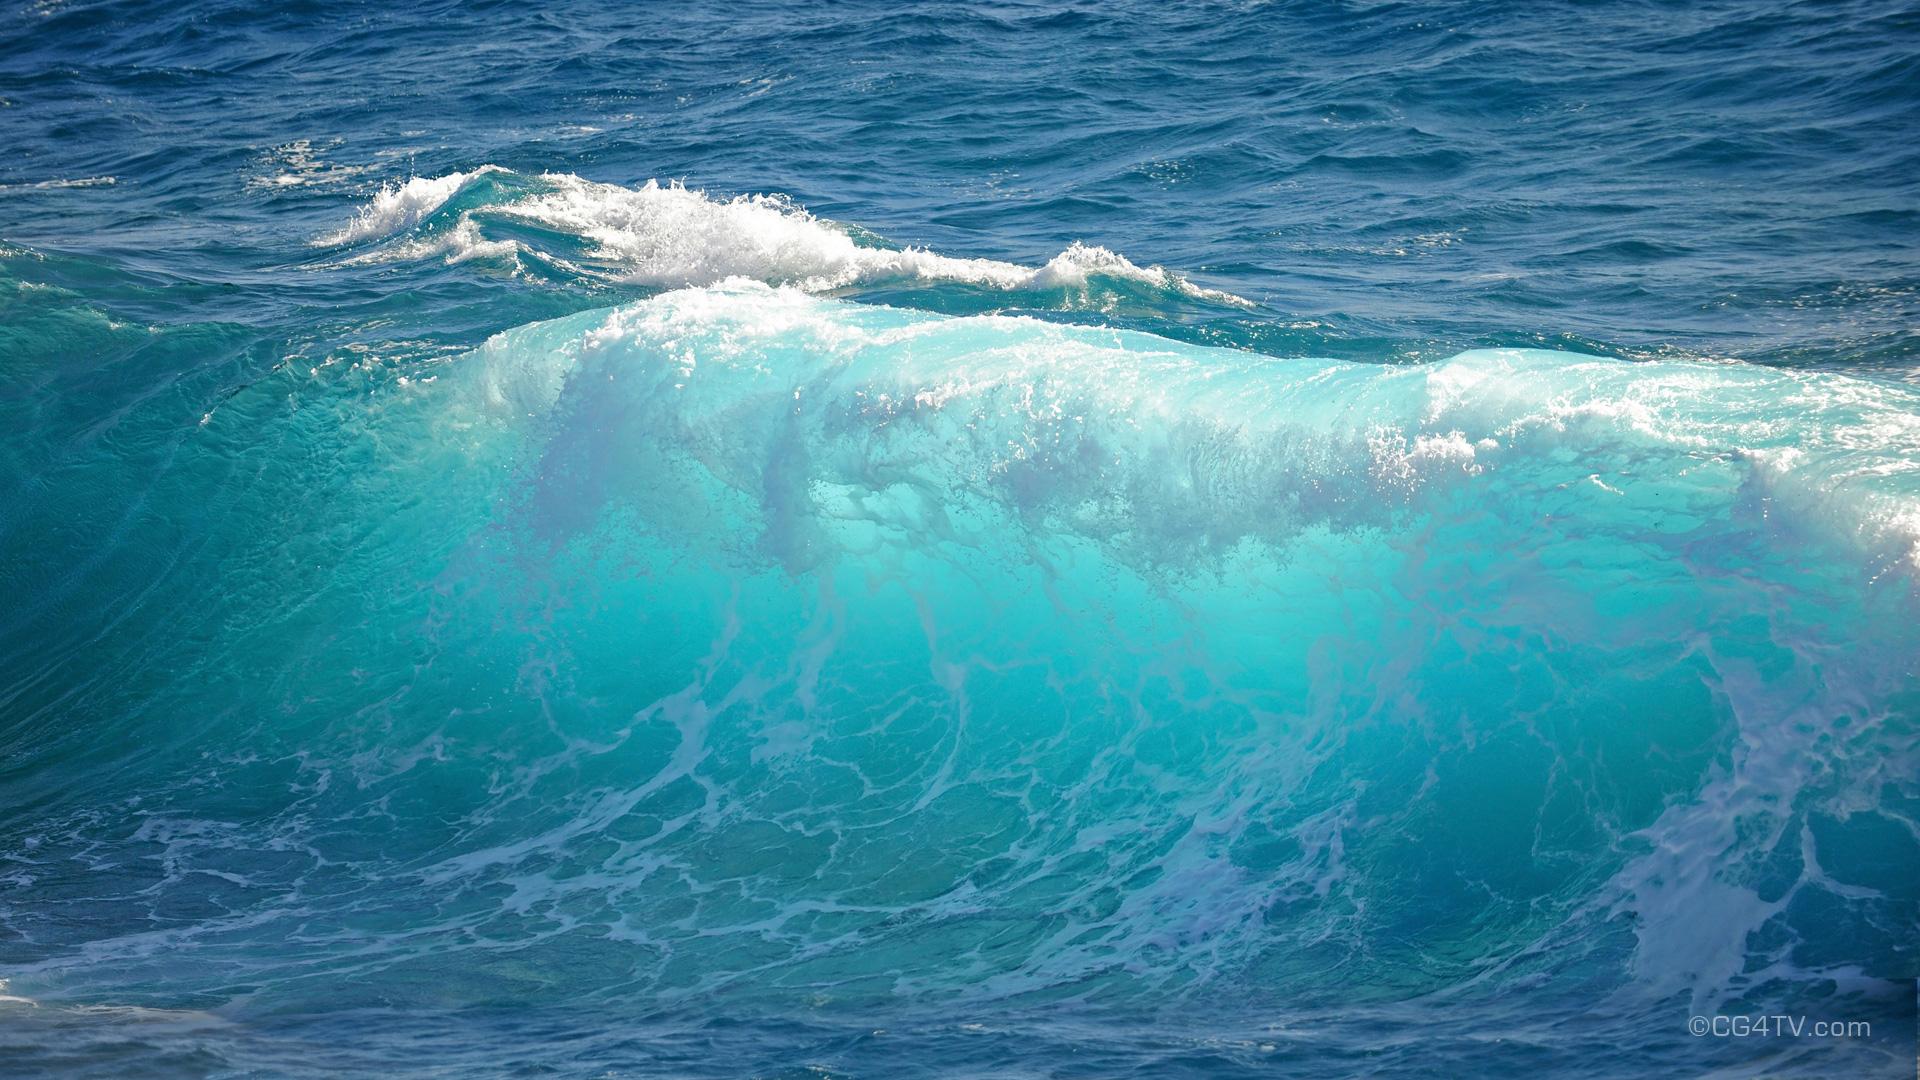 Ocean and Waves Energy essay